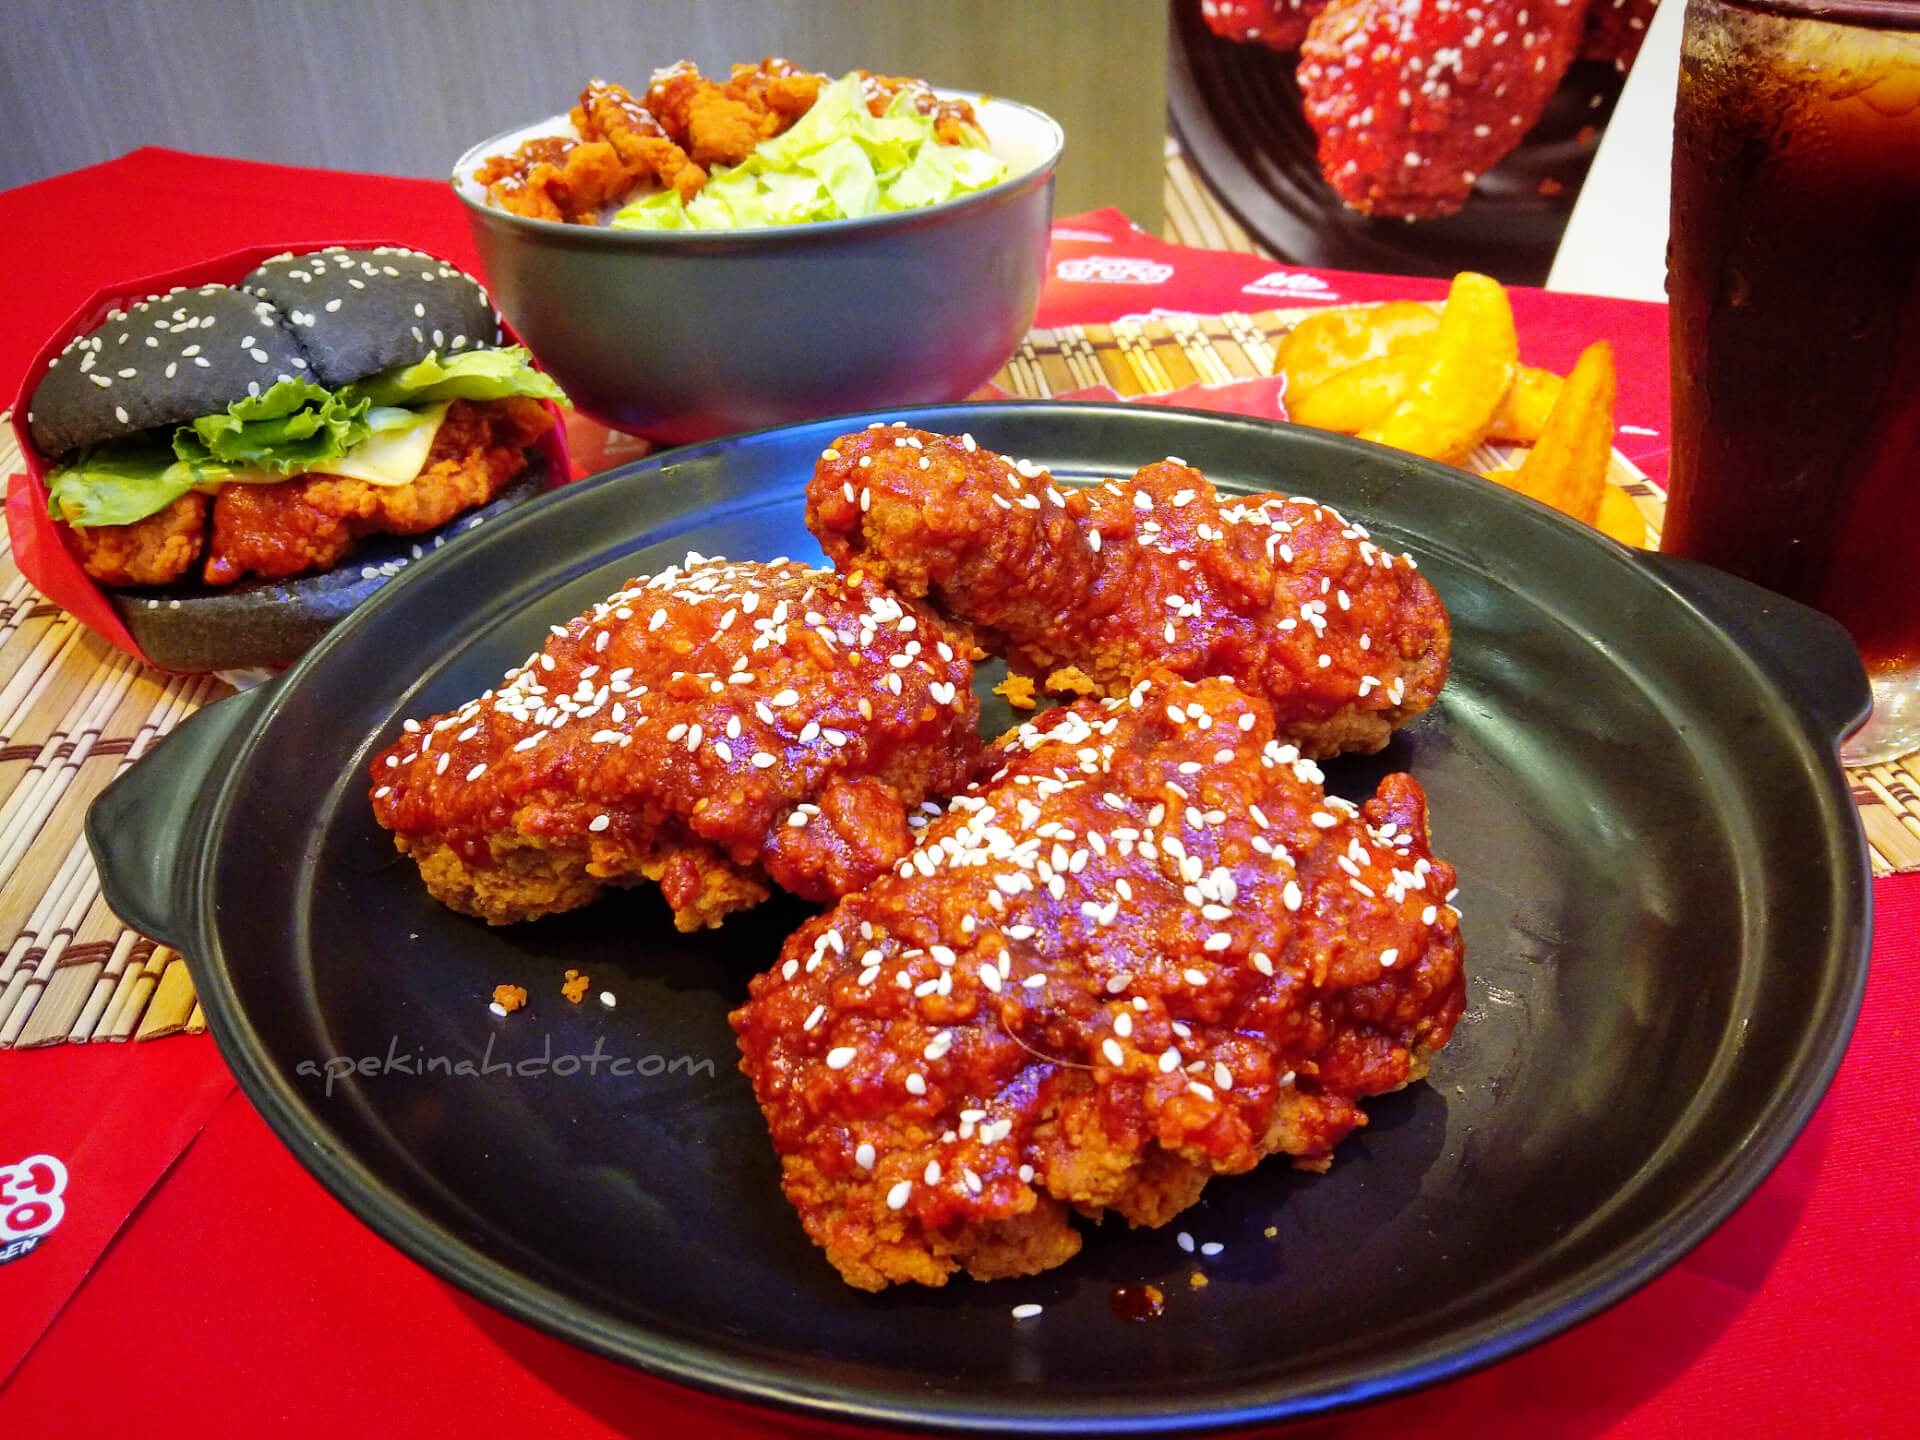 Nikmati Sajian Istimewa Ayam Gangjeong Di Marrybrown Sentuhan Inspirasi Dari Negara Korea